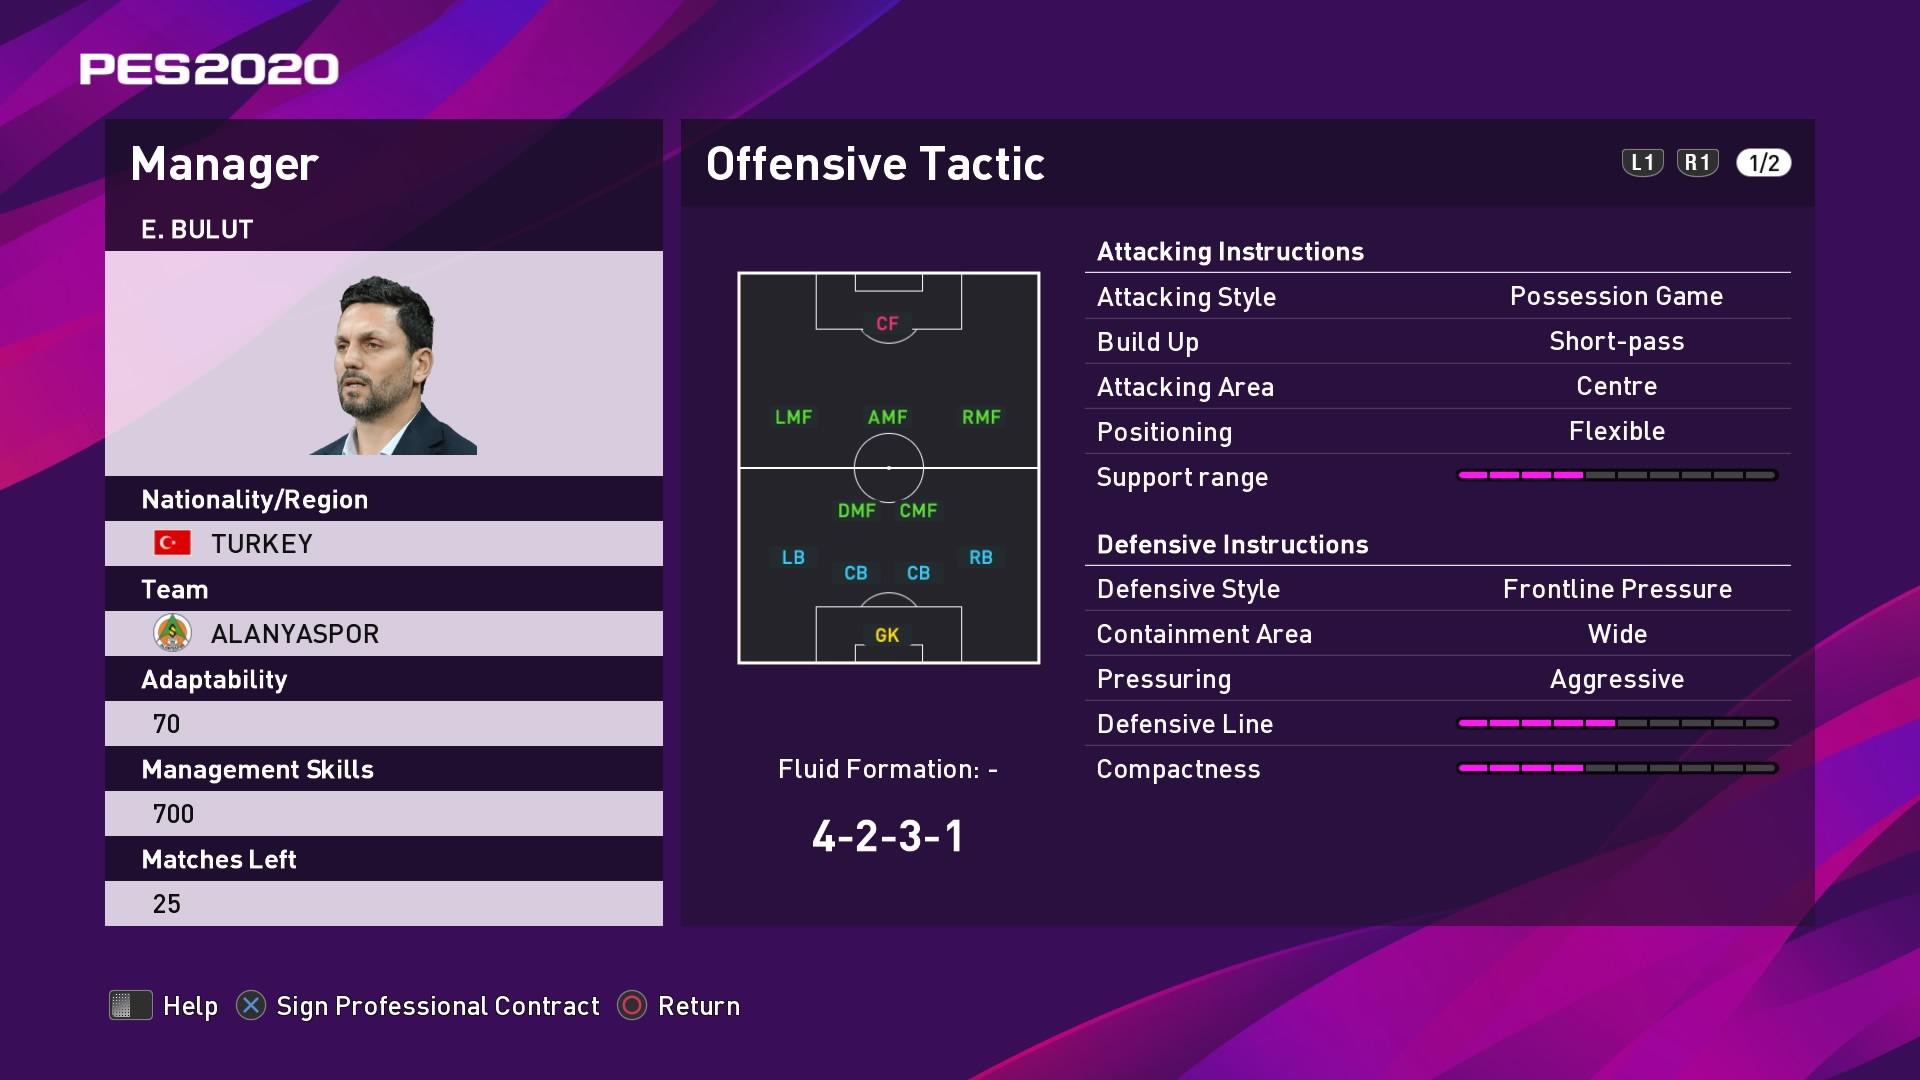 E. Bulut (Erol Bulut) Offensive Tactic in PES 2020 myClub